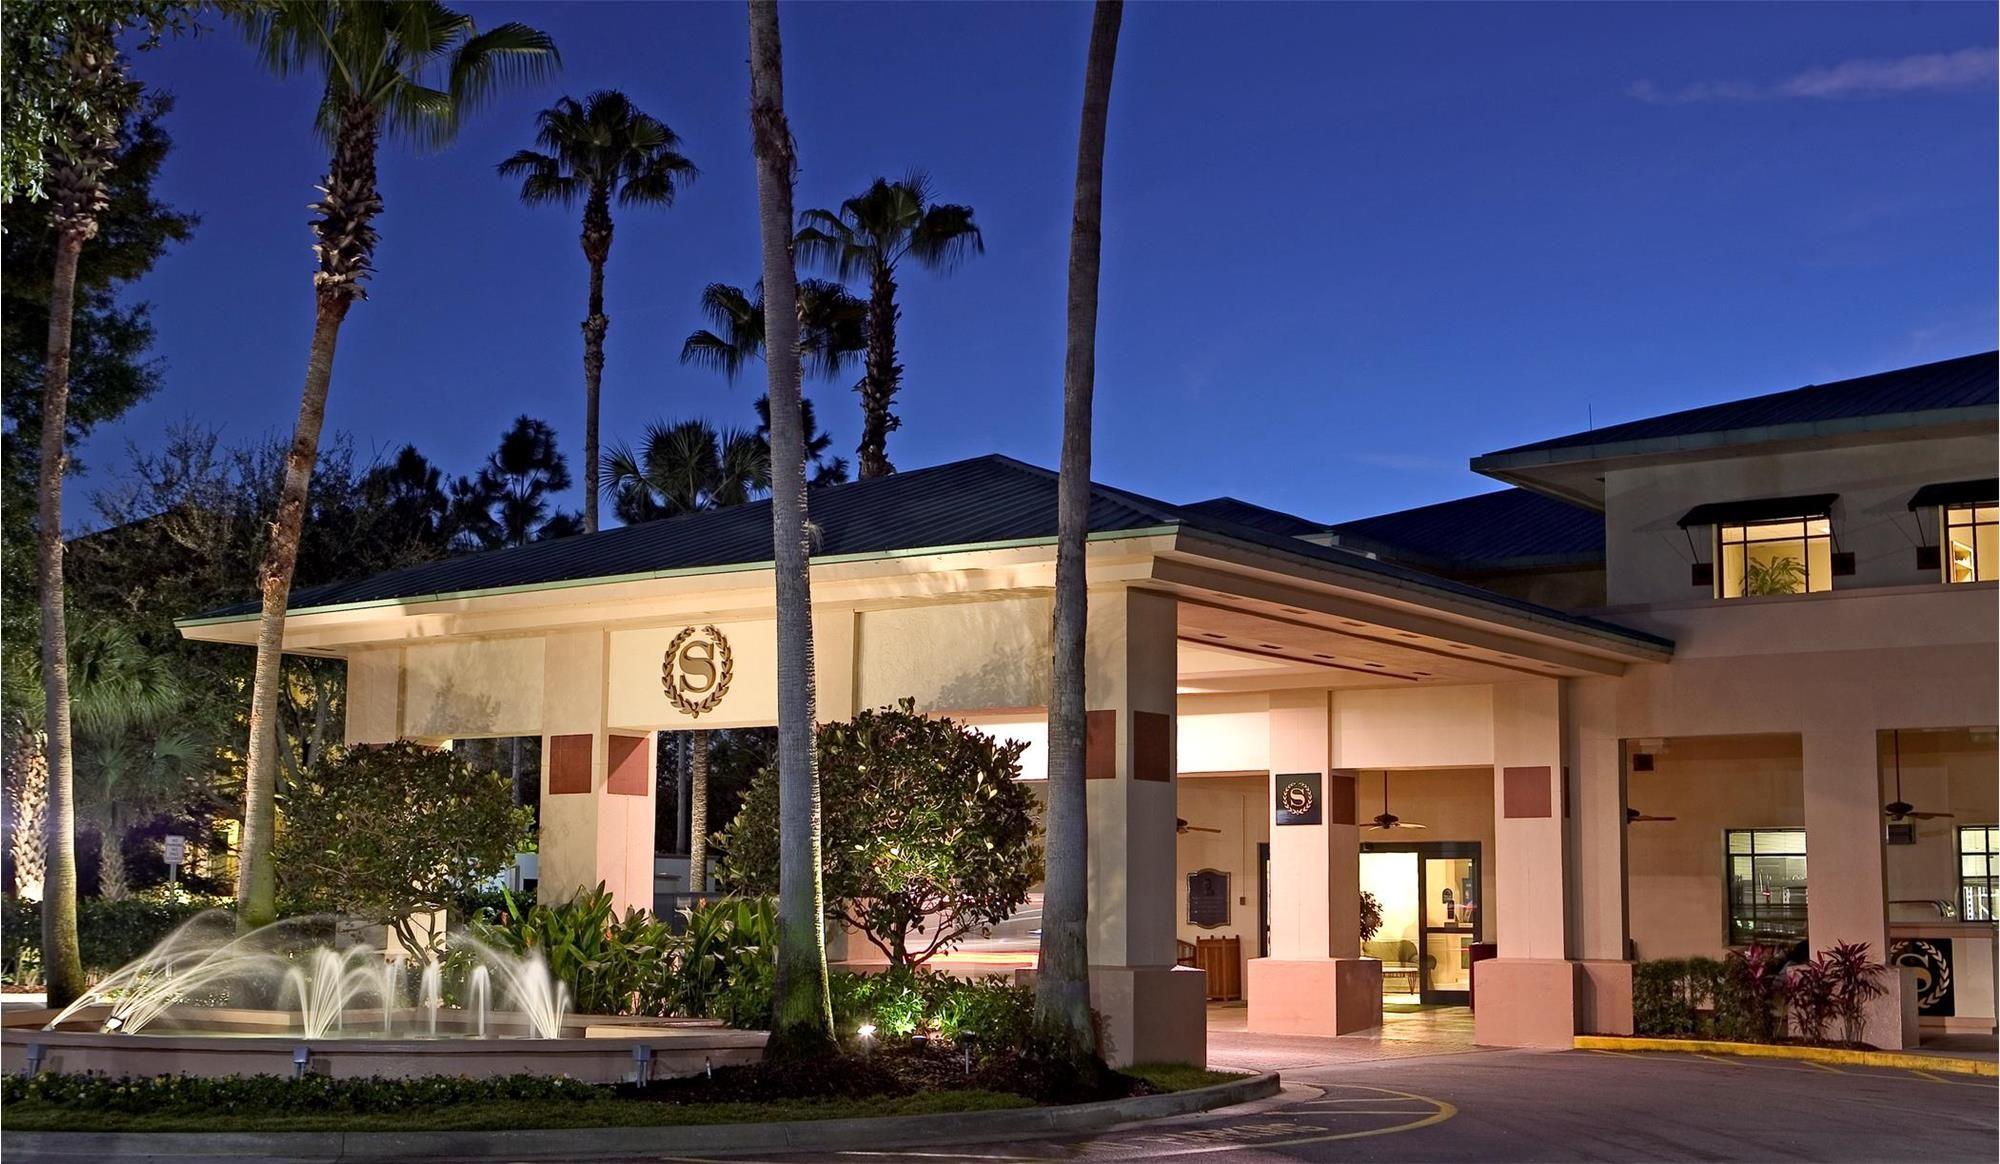 hotel review: sheraton vistana resort villas, orlando, usa | trip